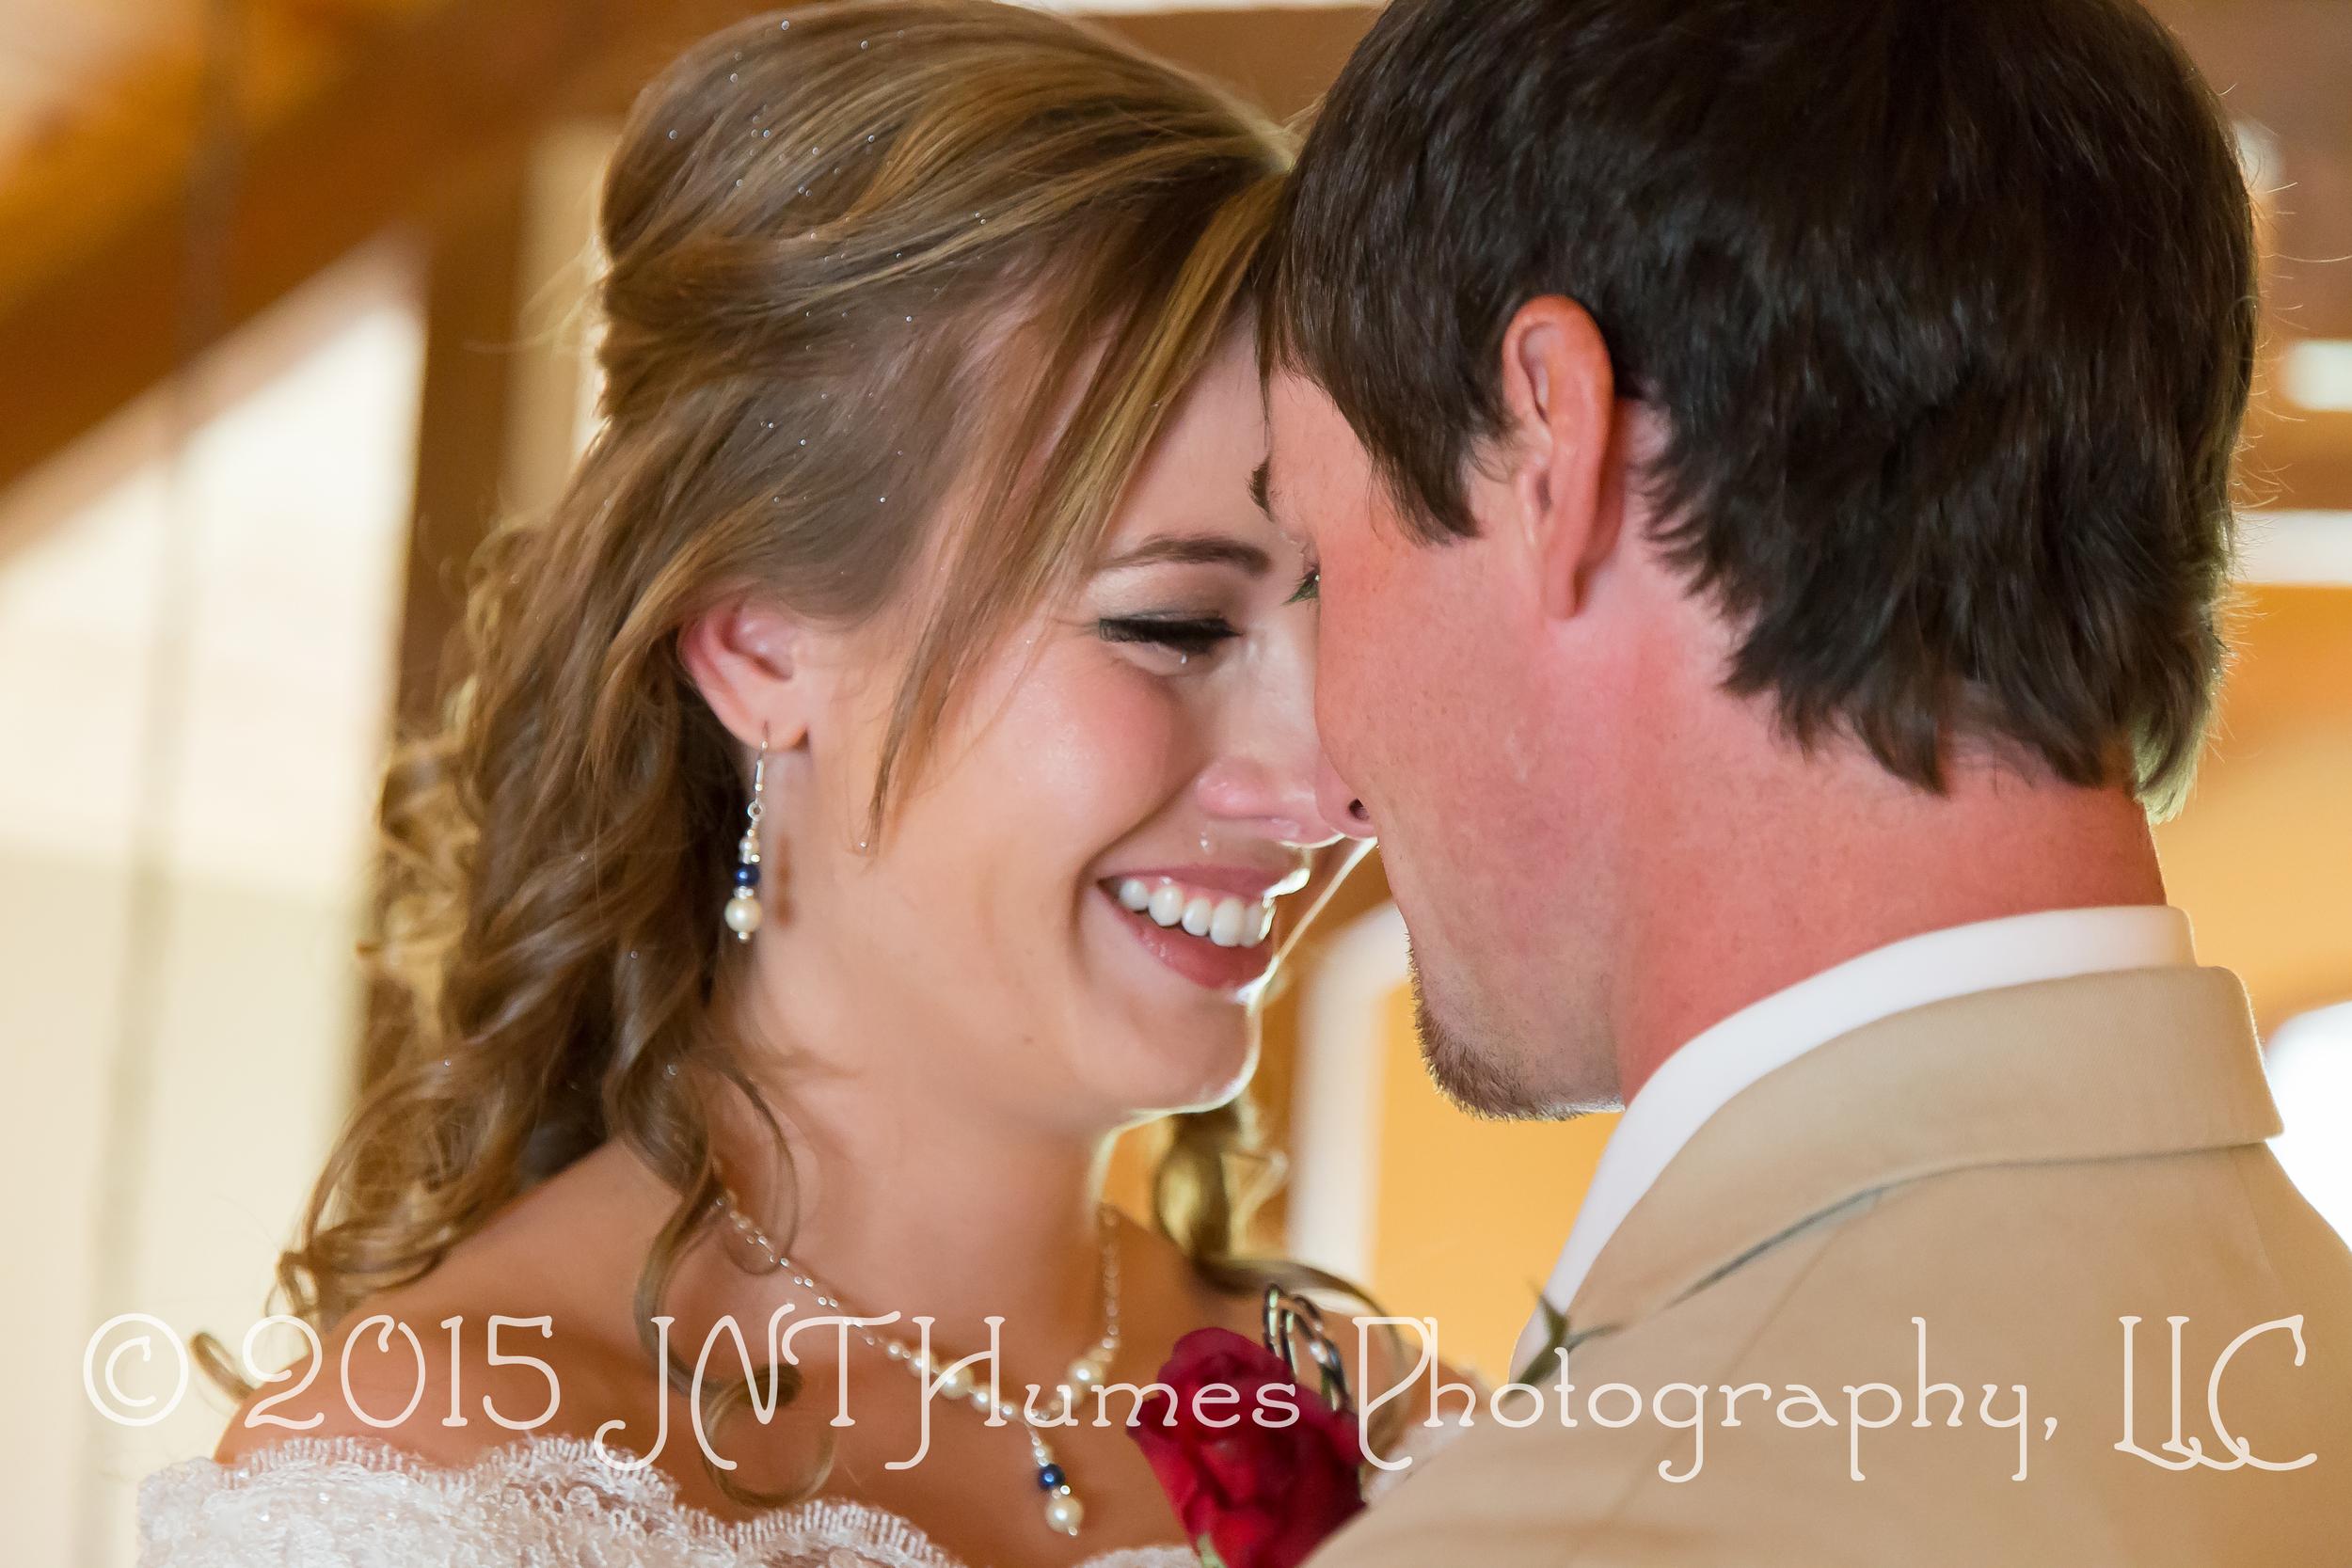 20151003-IMG_28202015-10-03© 2015 JNT Humes Photography, LLC.jpg